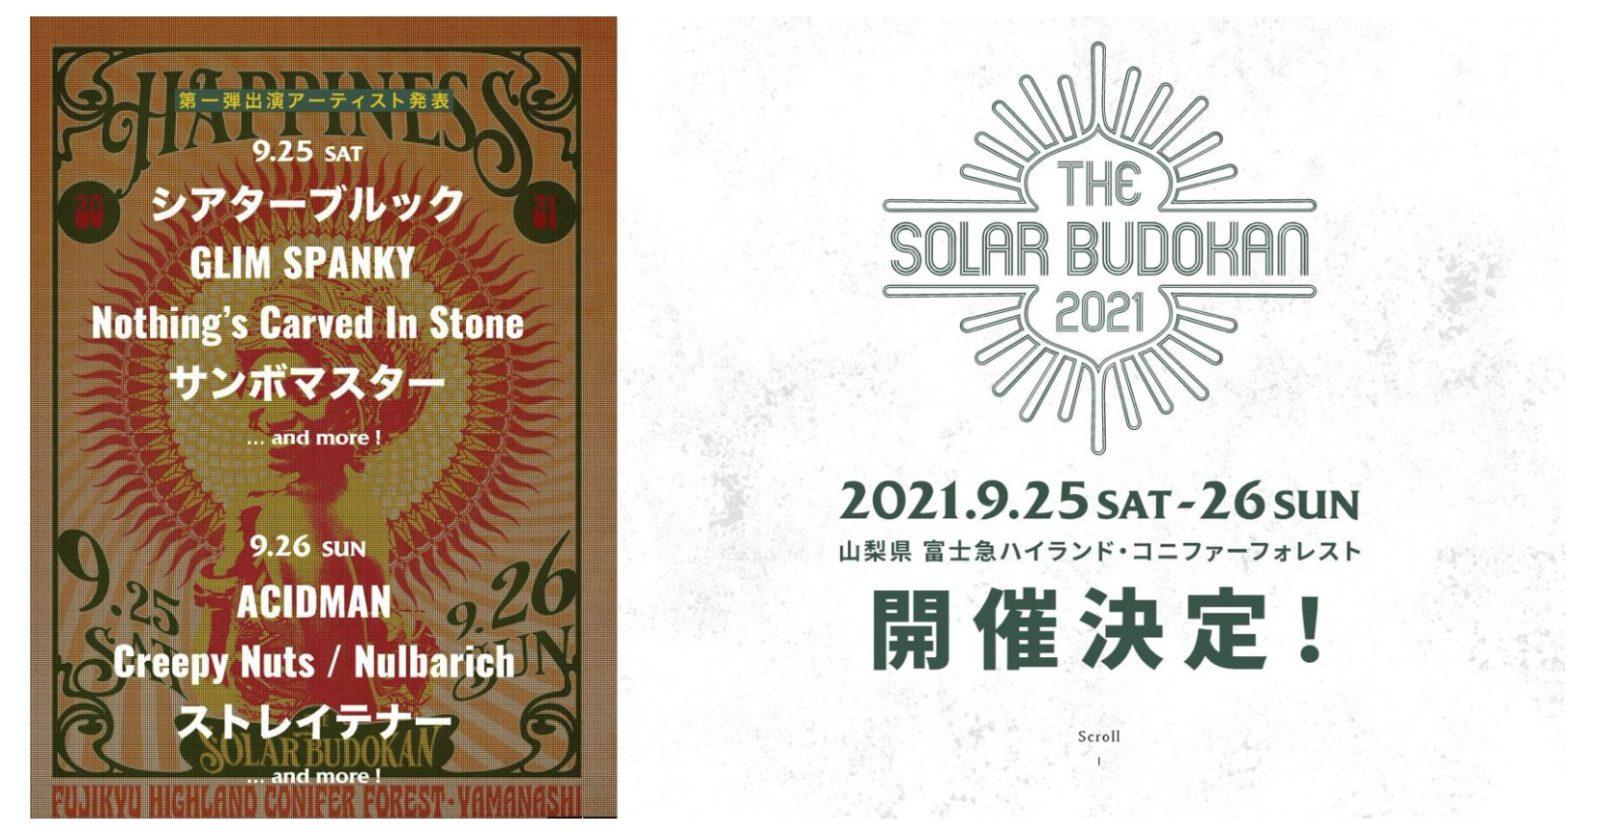 THE SOLAR BUDOKAN 2021 開催決定!!!